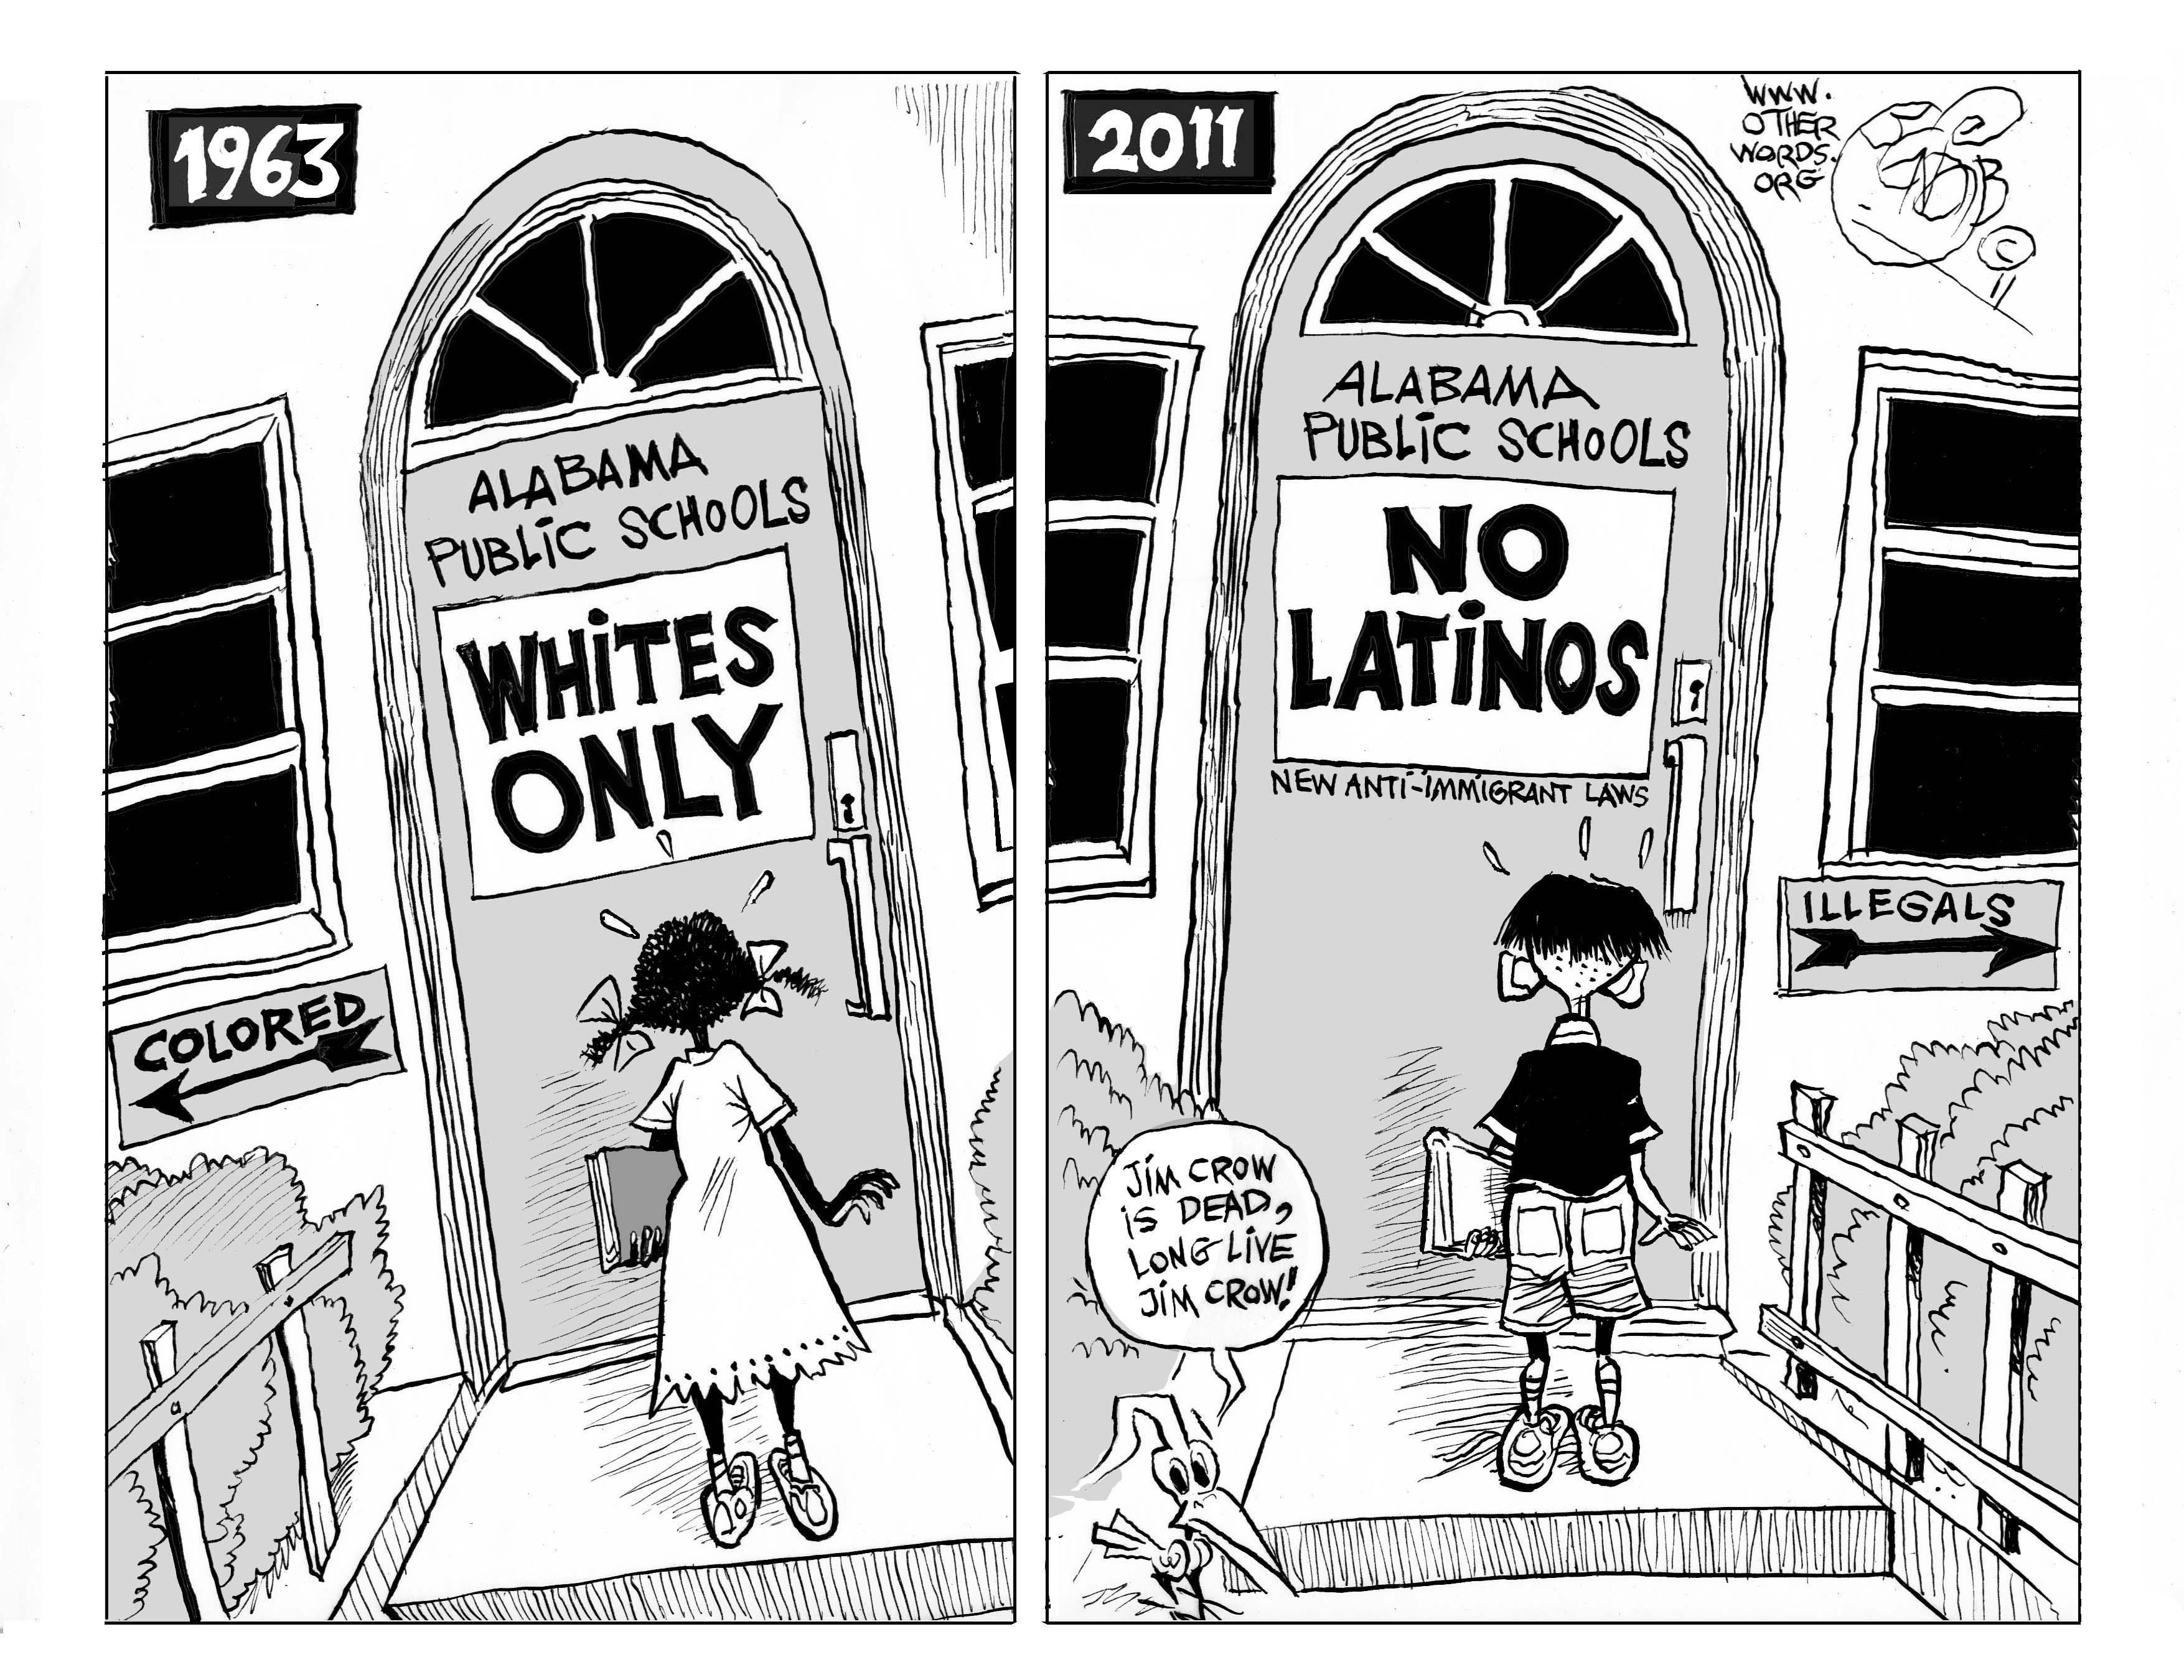 Public School Cartoon Alabama-immigration-cartoon.jpg